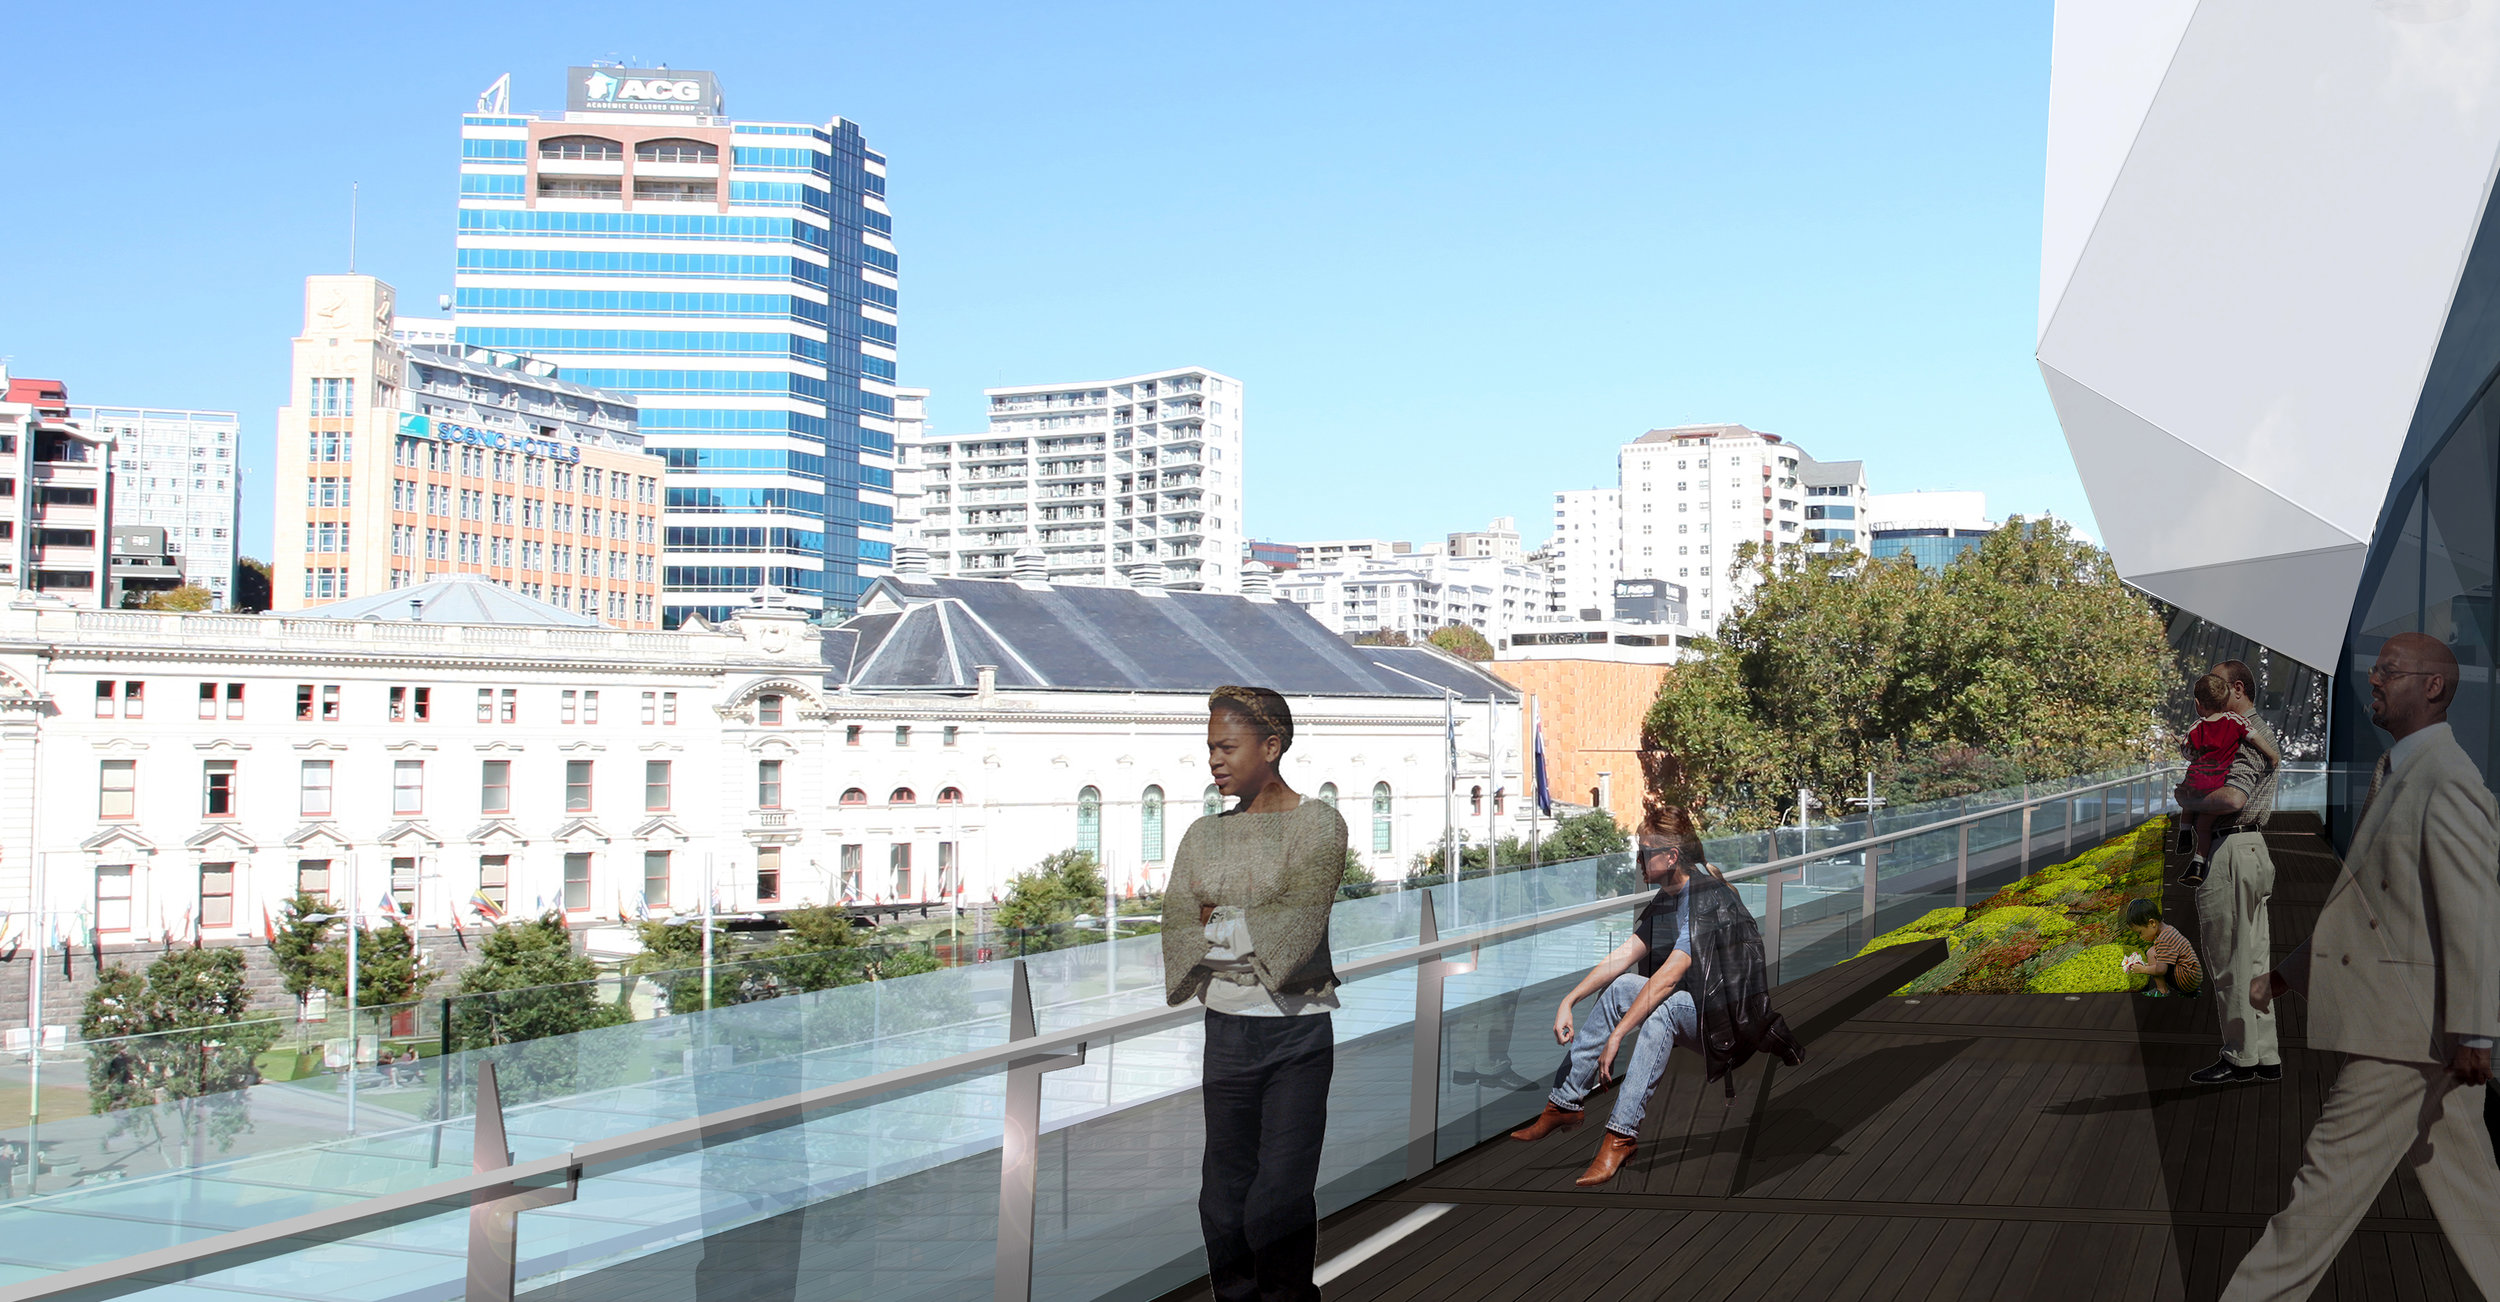 Aotea Centre Exterior Refurbishment Render_View from Level 5 Balcony.jpg